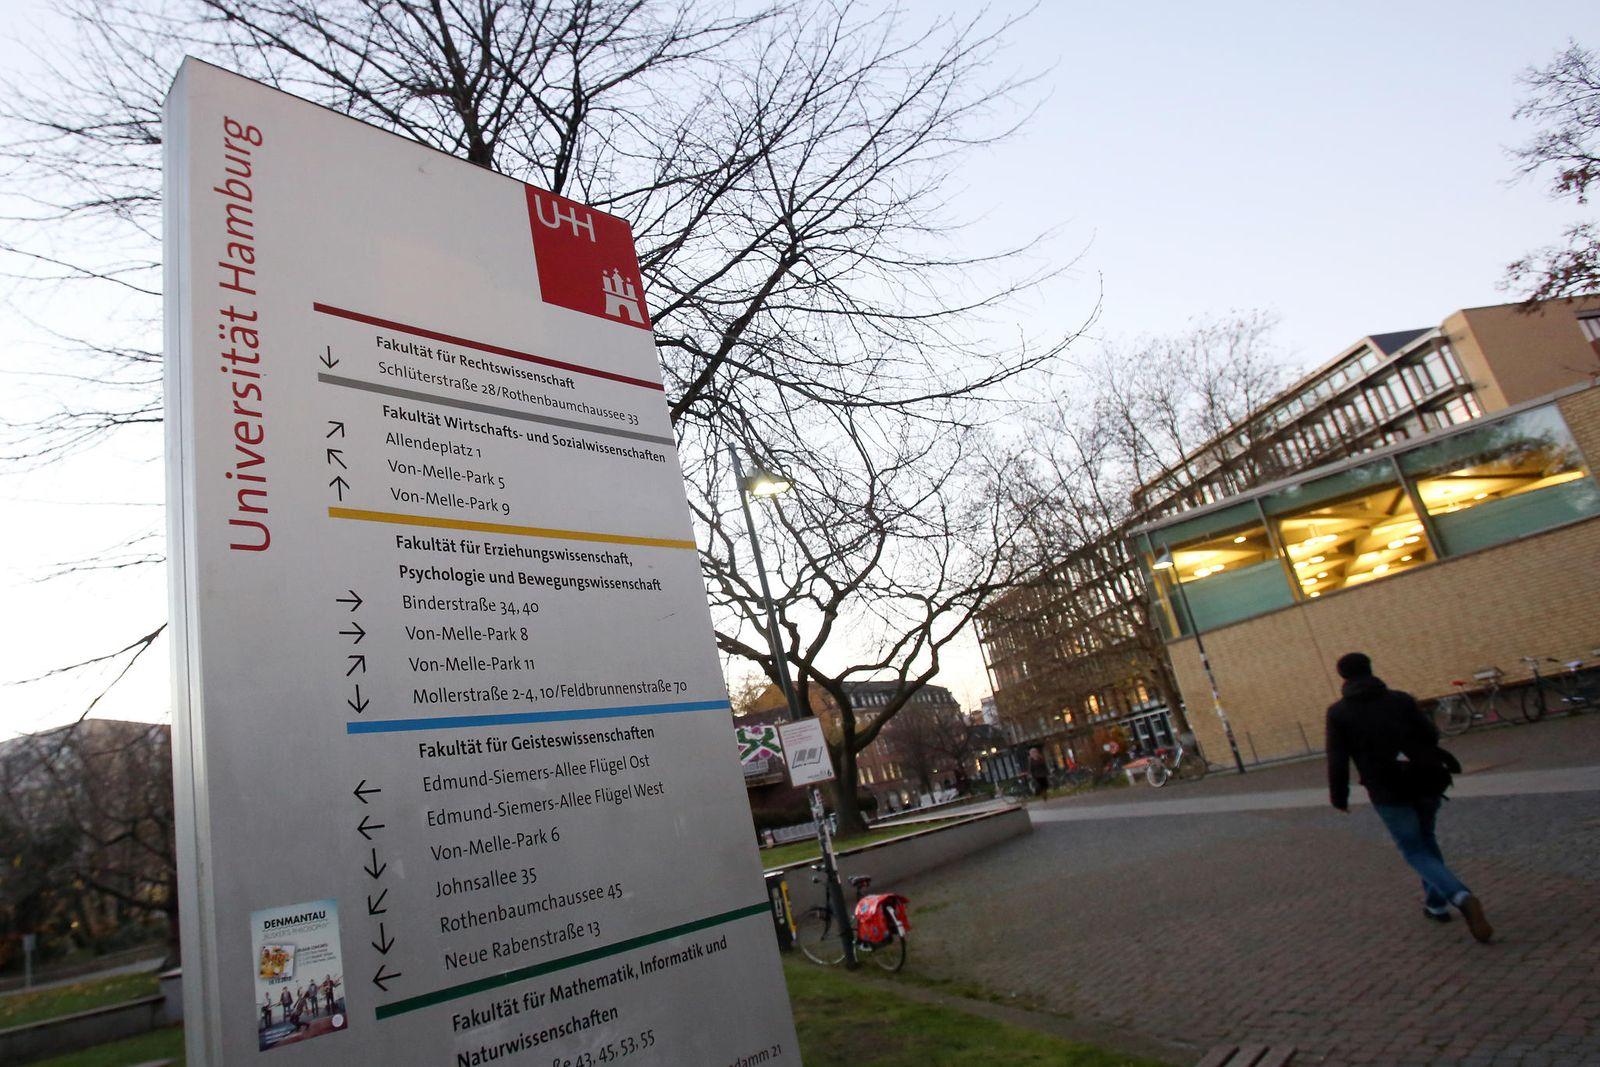 Campus-Uni-Hamburg